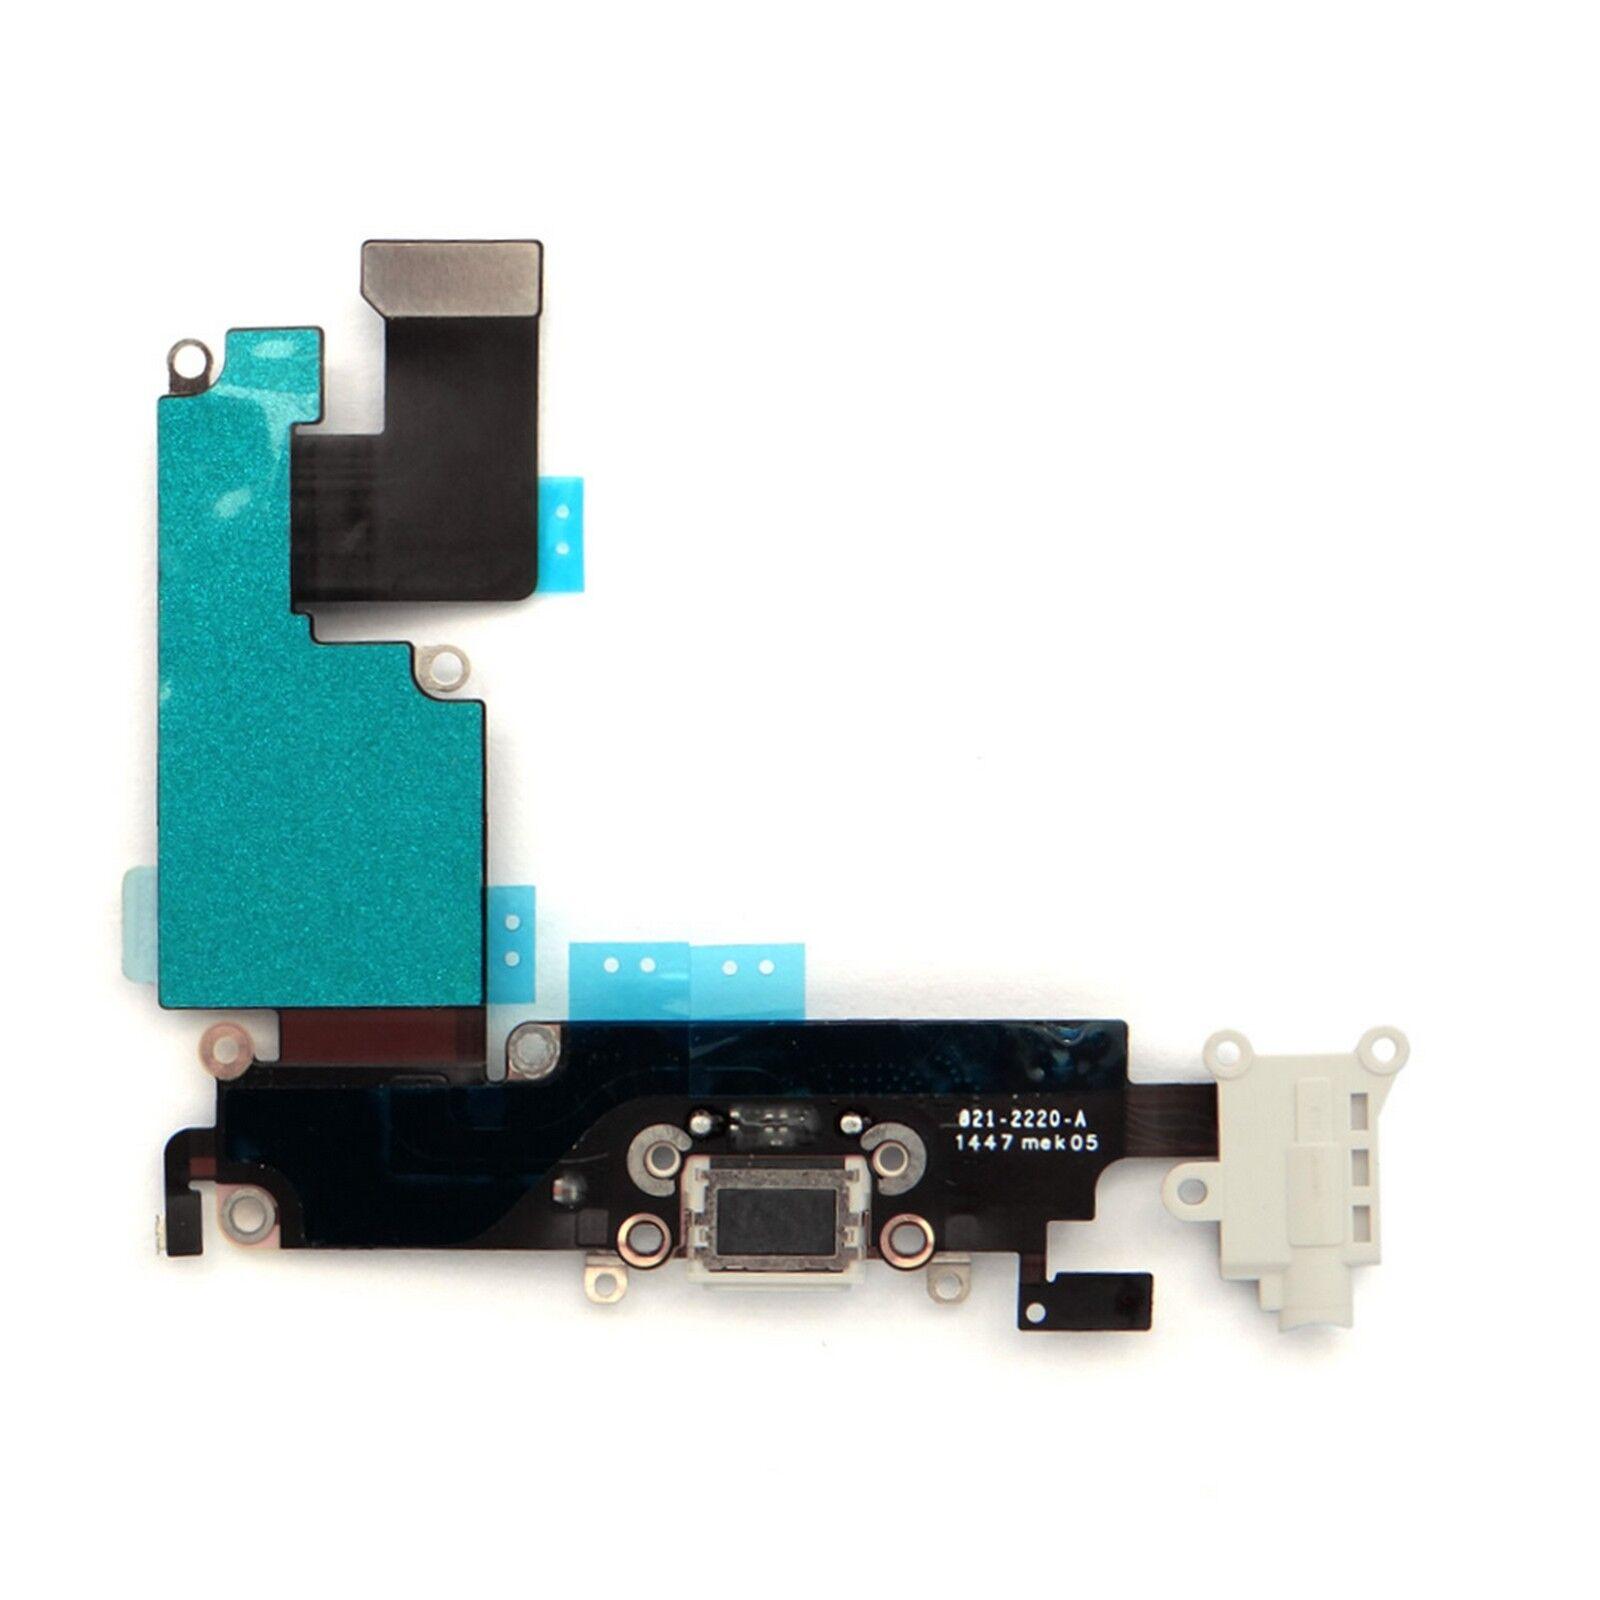 digital bay connettore carica dock microfono ricarica audio apple iphone 6 plus bianco